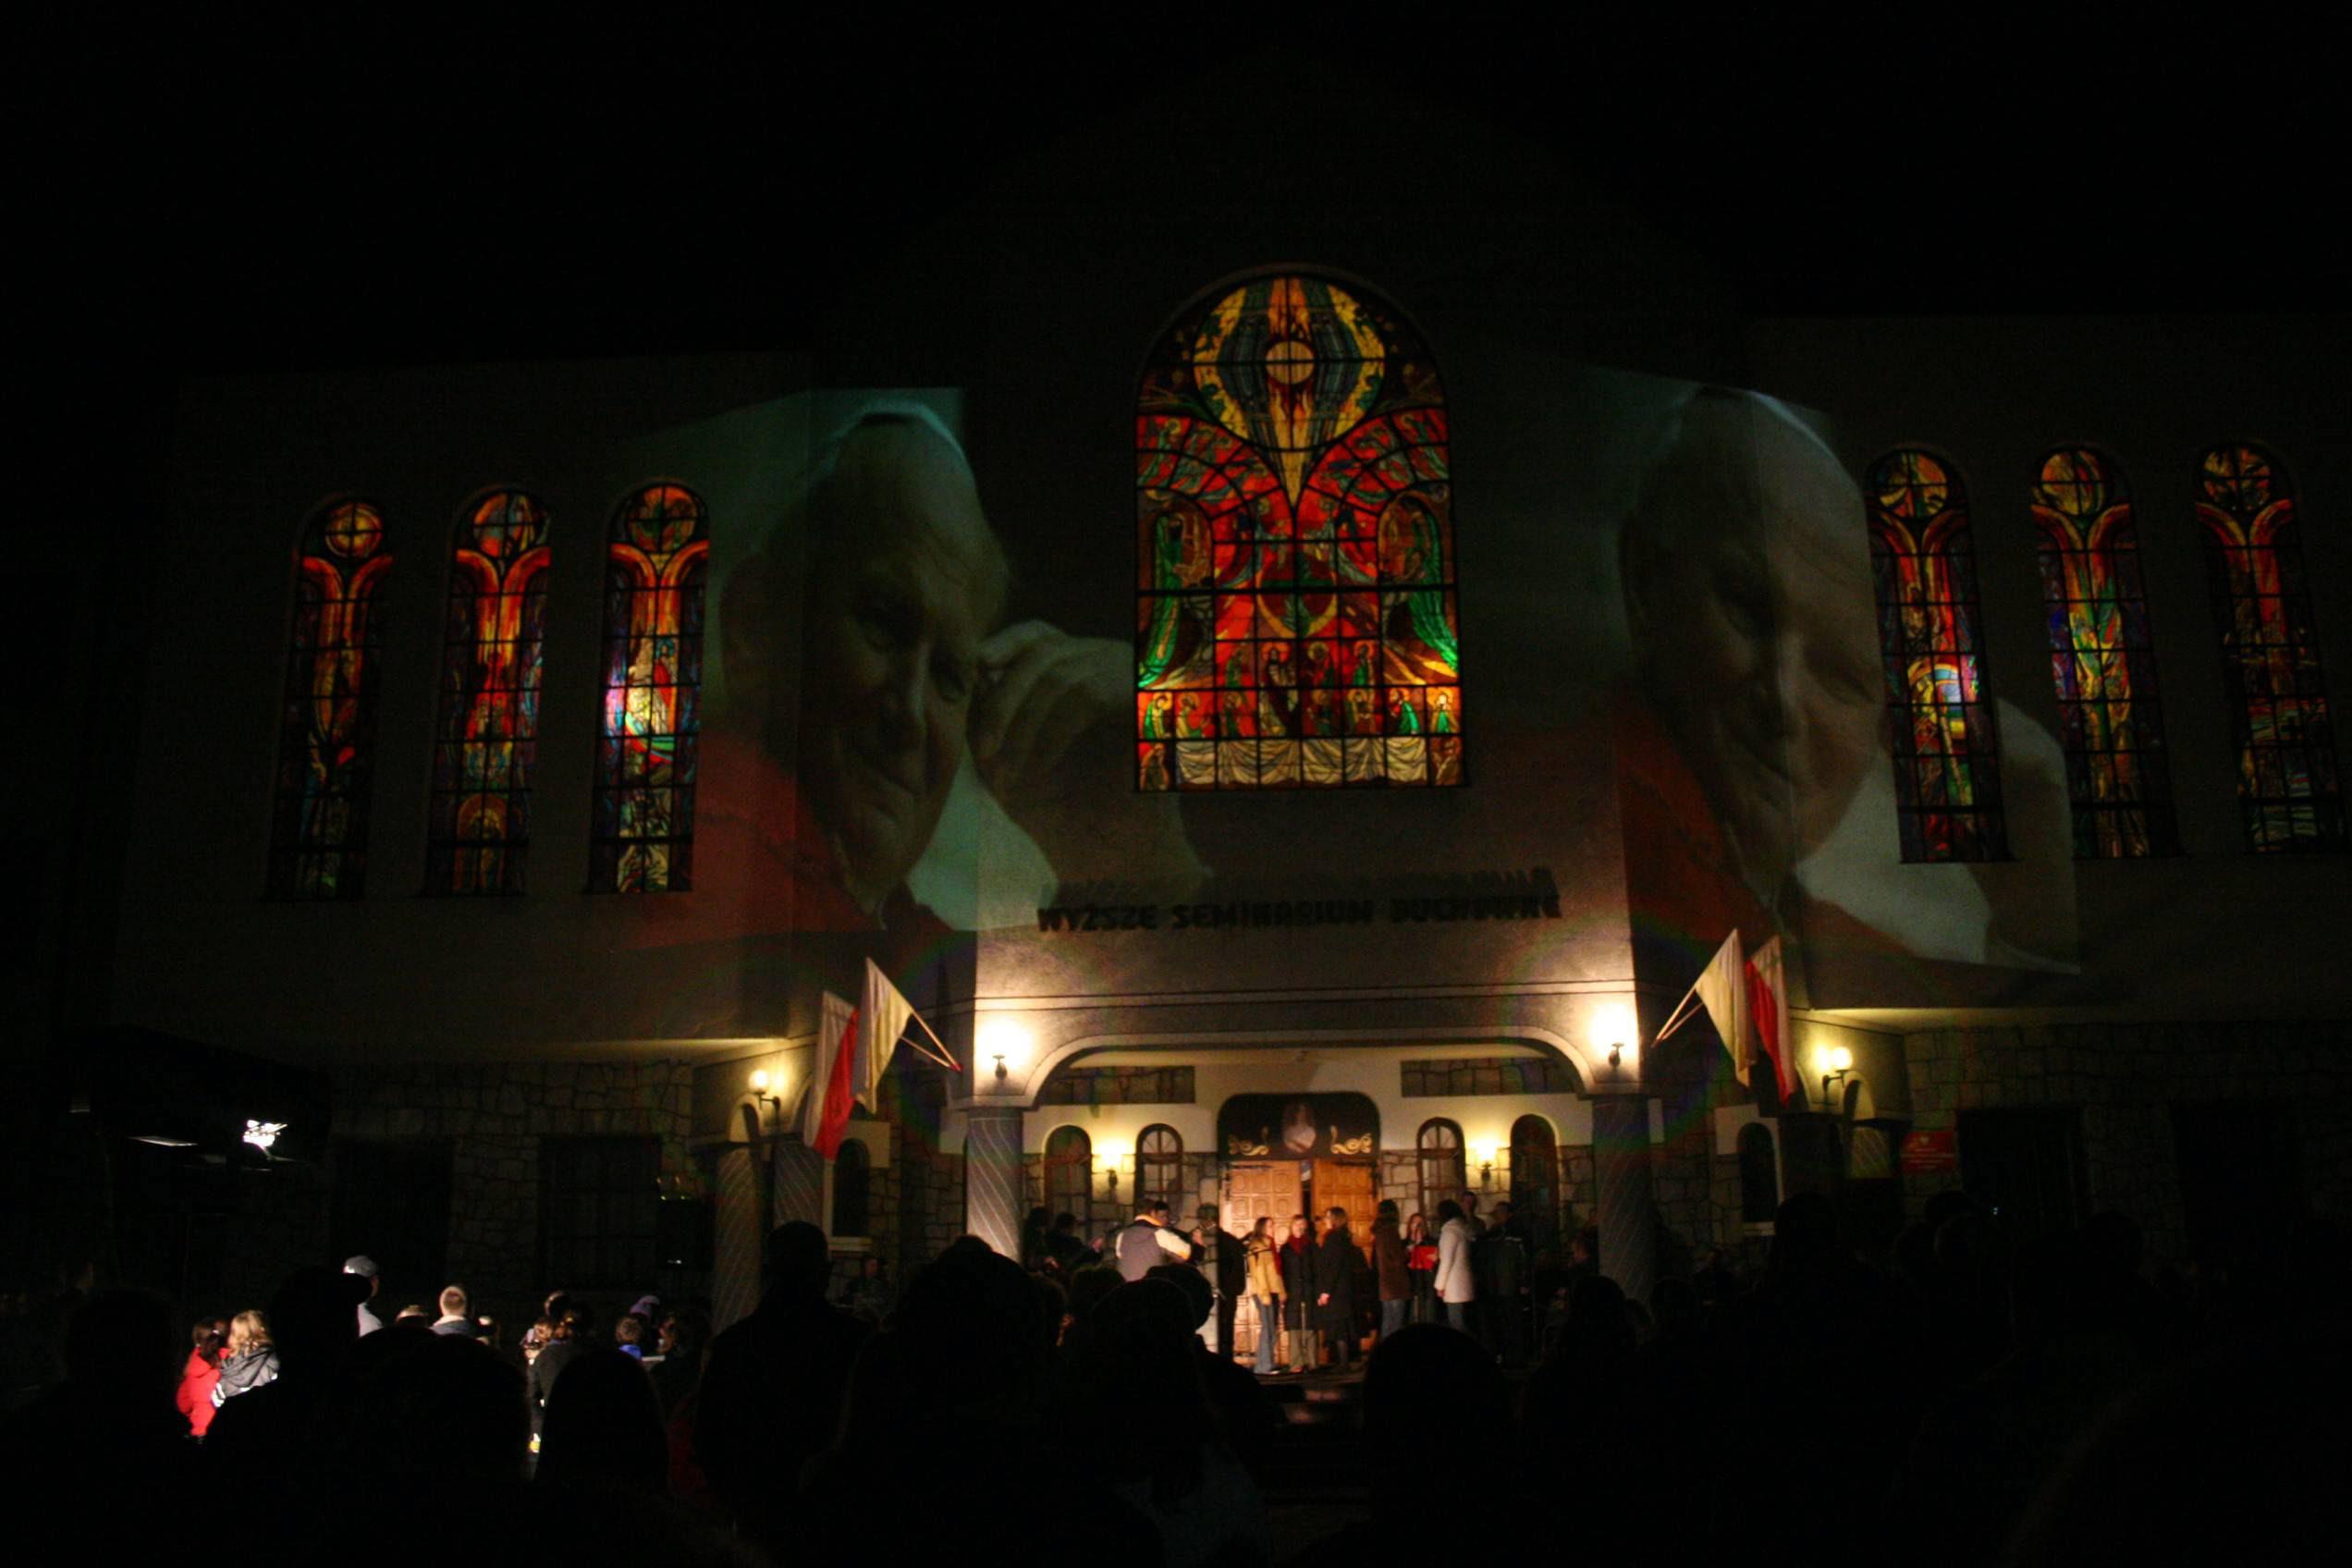 Wyższe Seminarium Duchowne w Radomiu (fot. Karol Piętek / Agencja Gazeta)